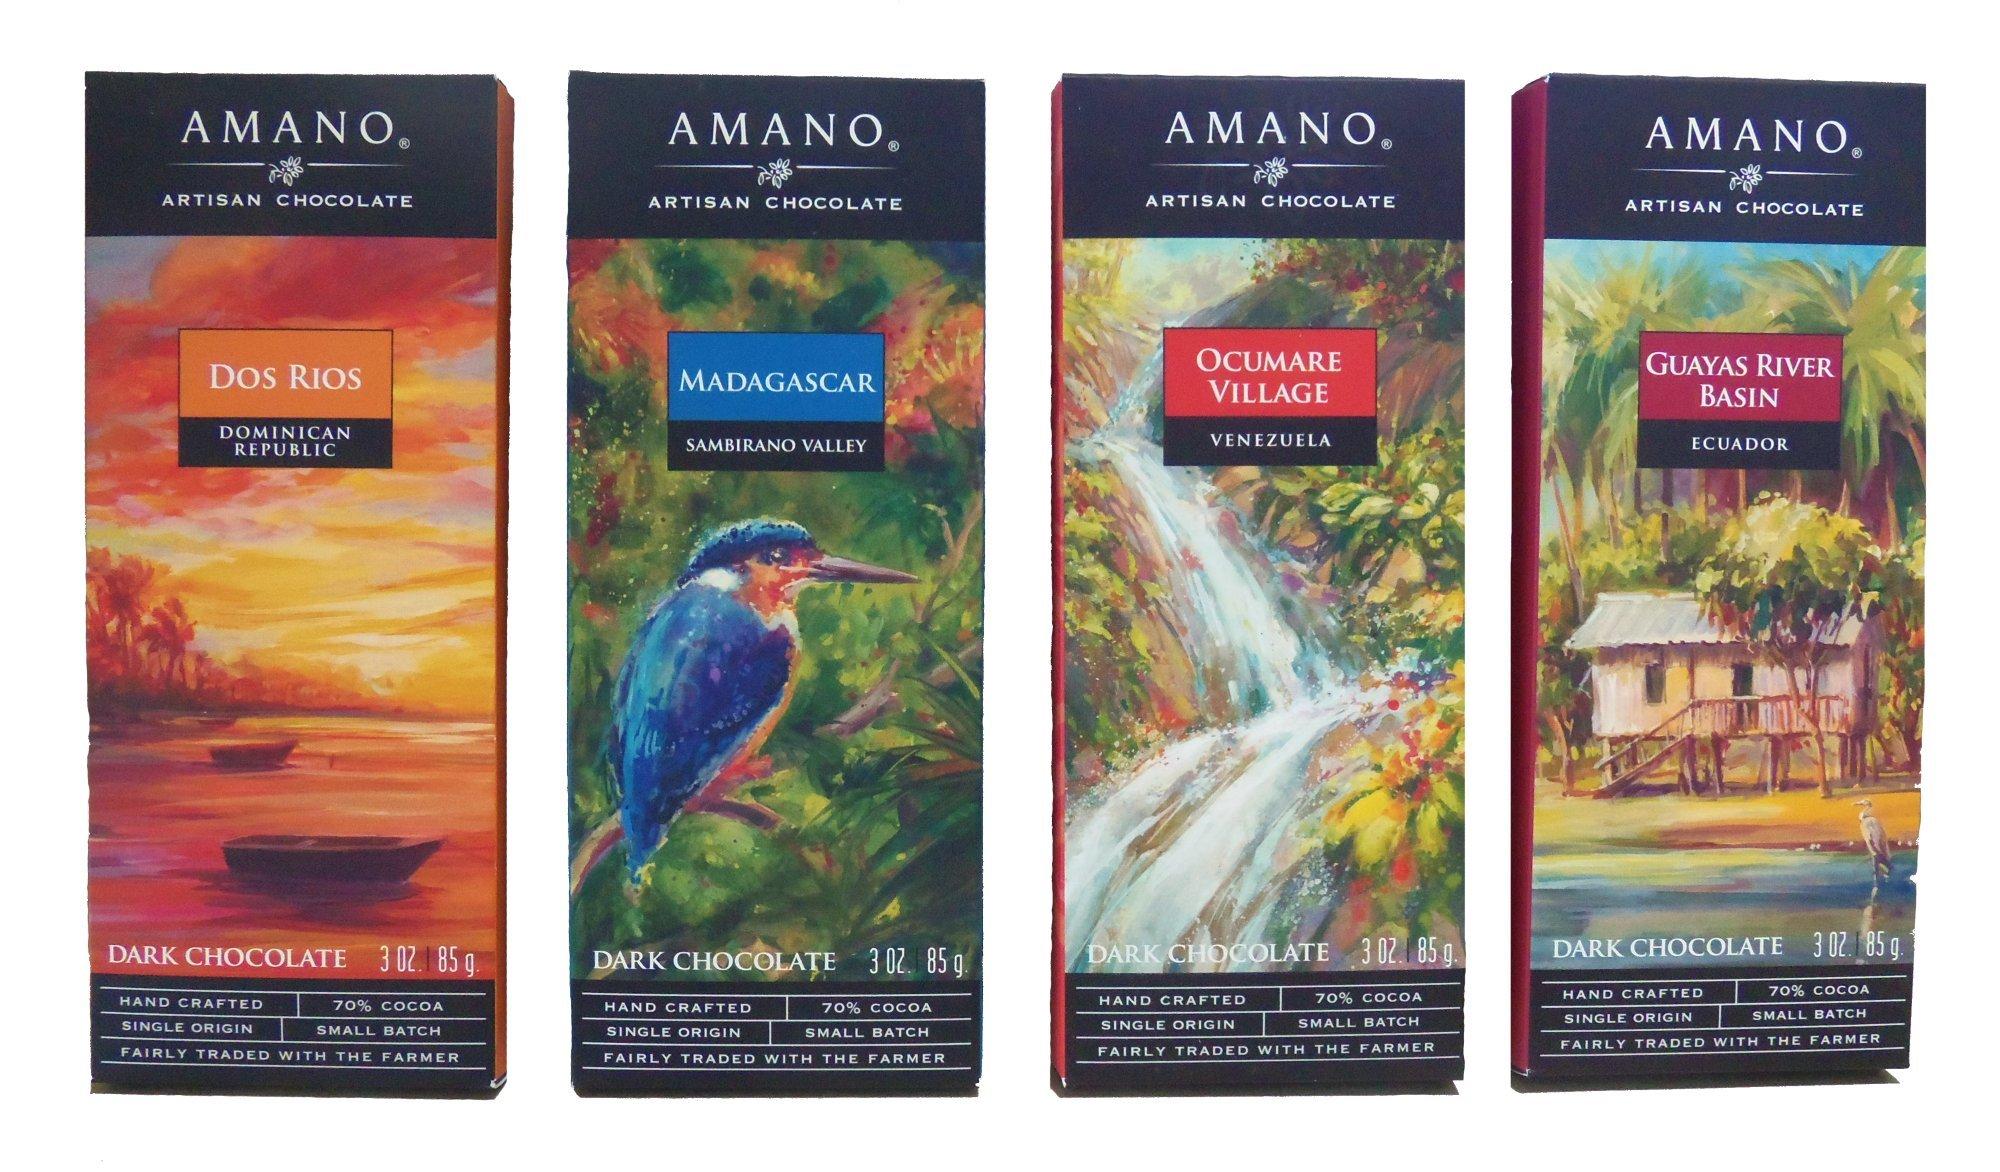 Amano Artisan Dark Chocolate Bar Variety Quartet - Dos Rios, Madagascar, Ocumare, & Guayas River Basin - 4 Bars, 3 Ounces Per Bar - Academy of Chocolate Award Winners!